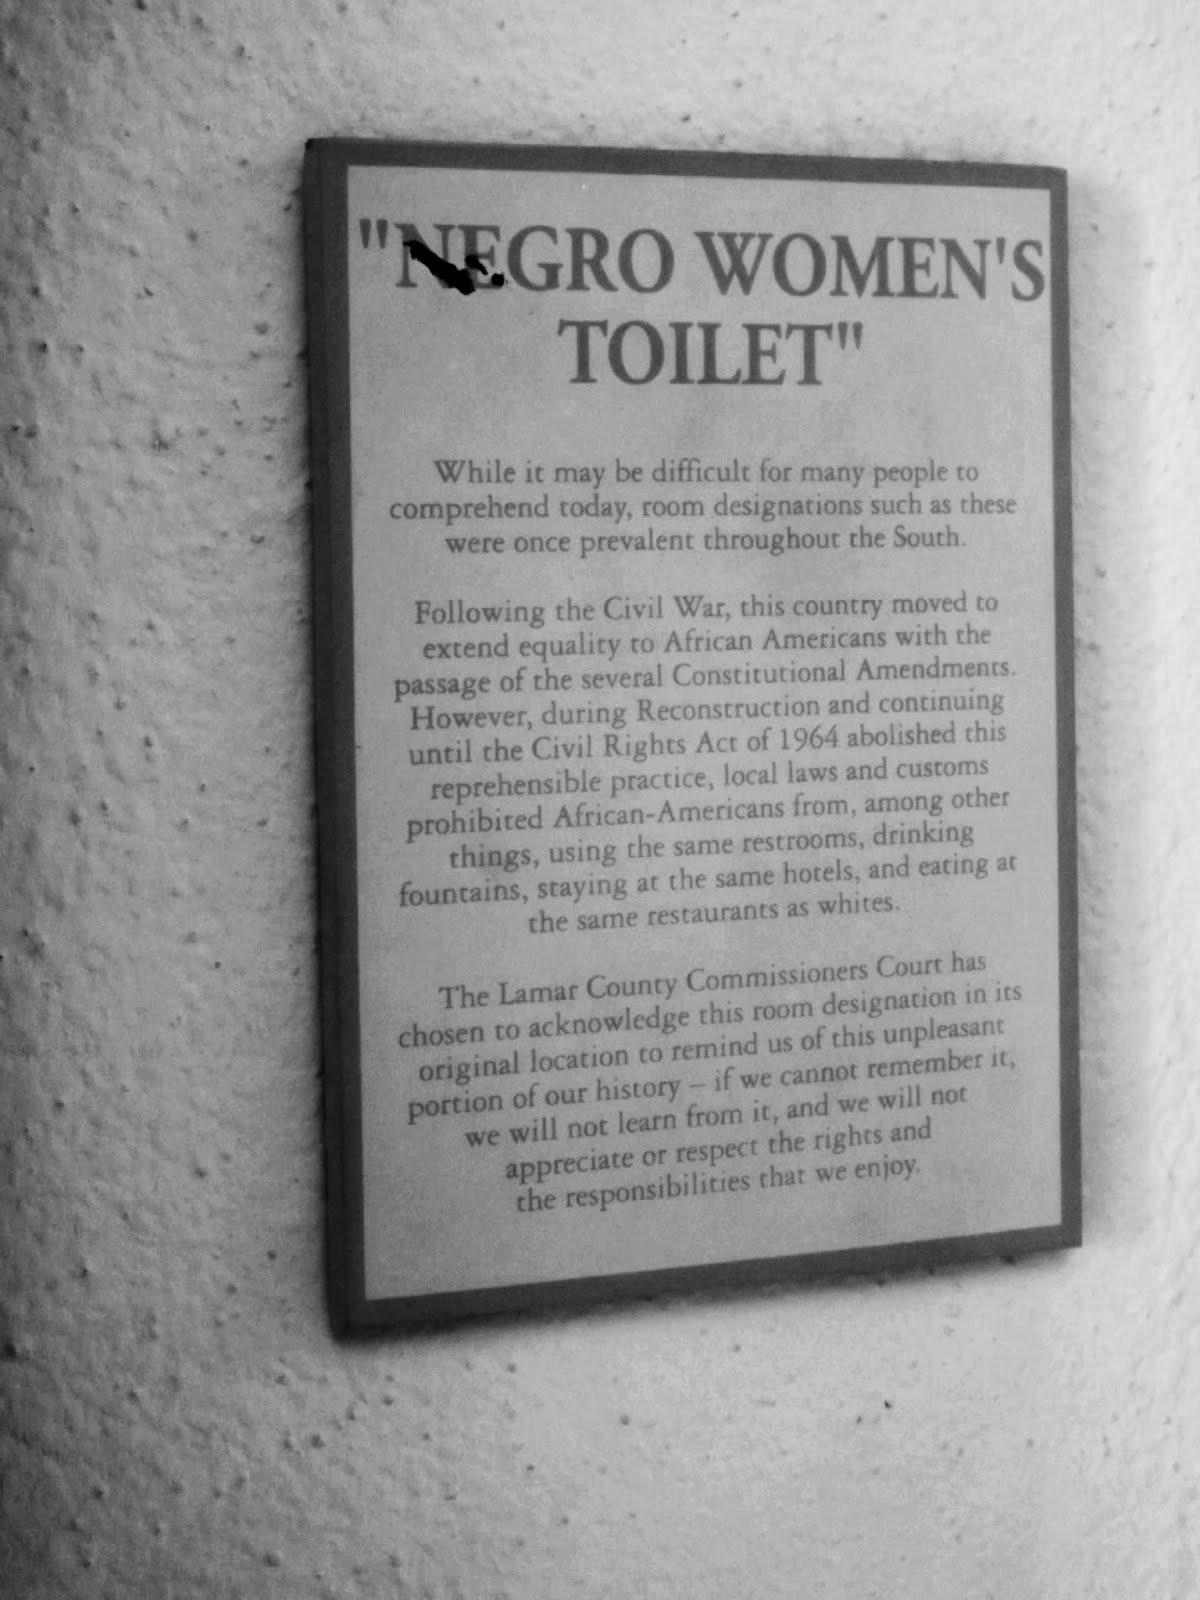 Bathroom Signs History paris texas, jim crow, negro toilet signs, cherished memories